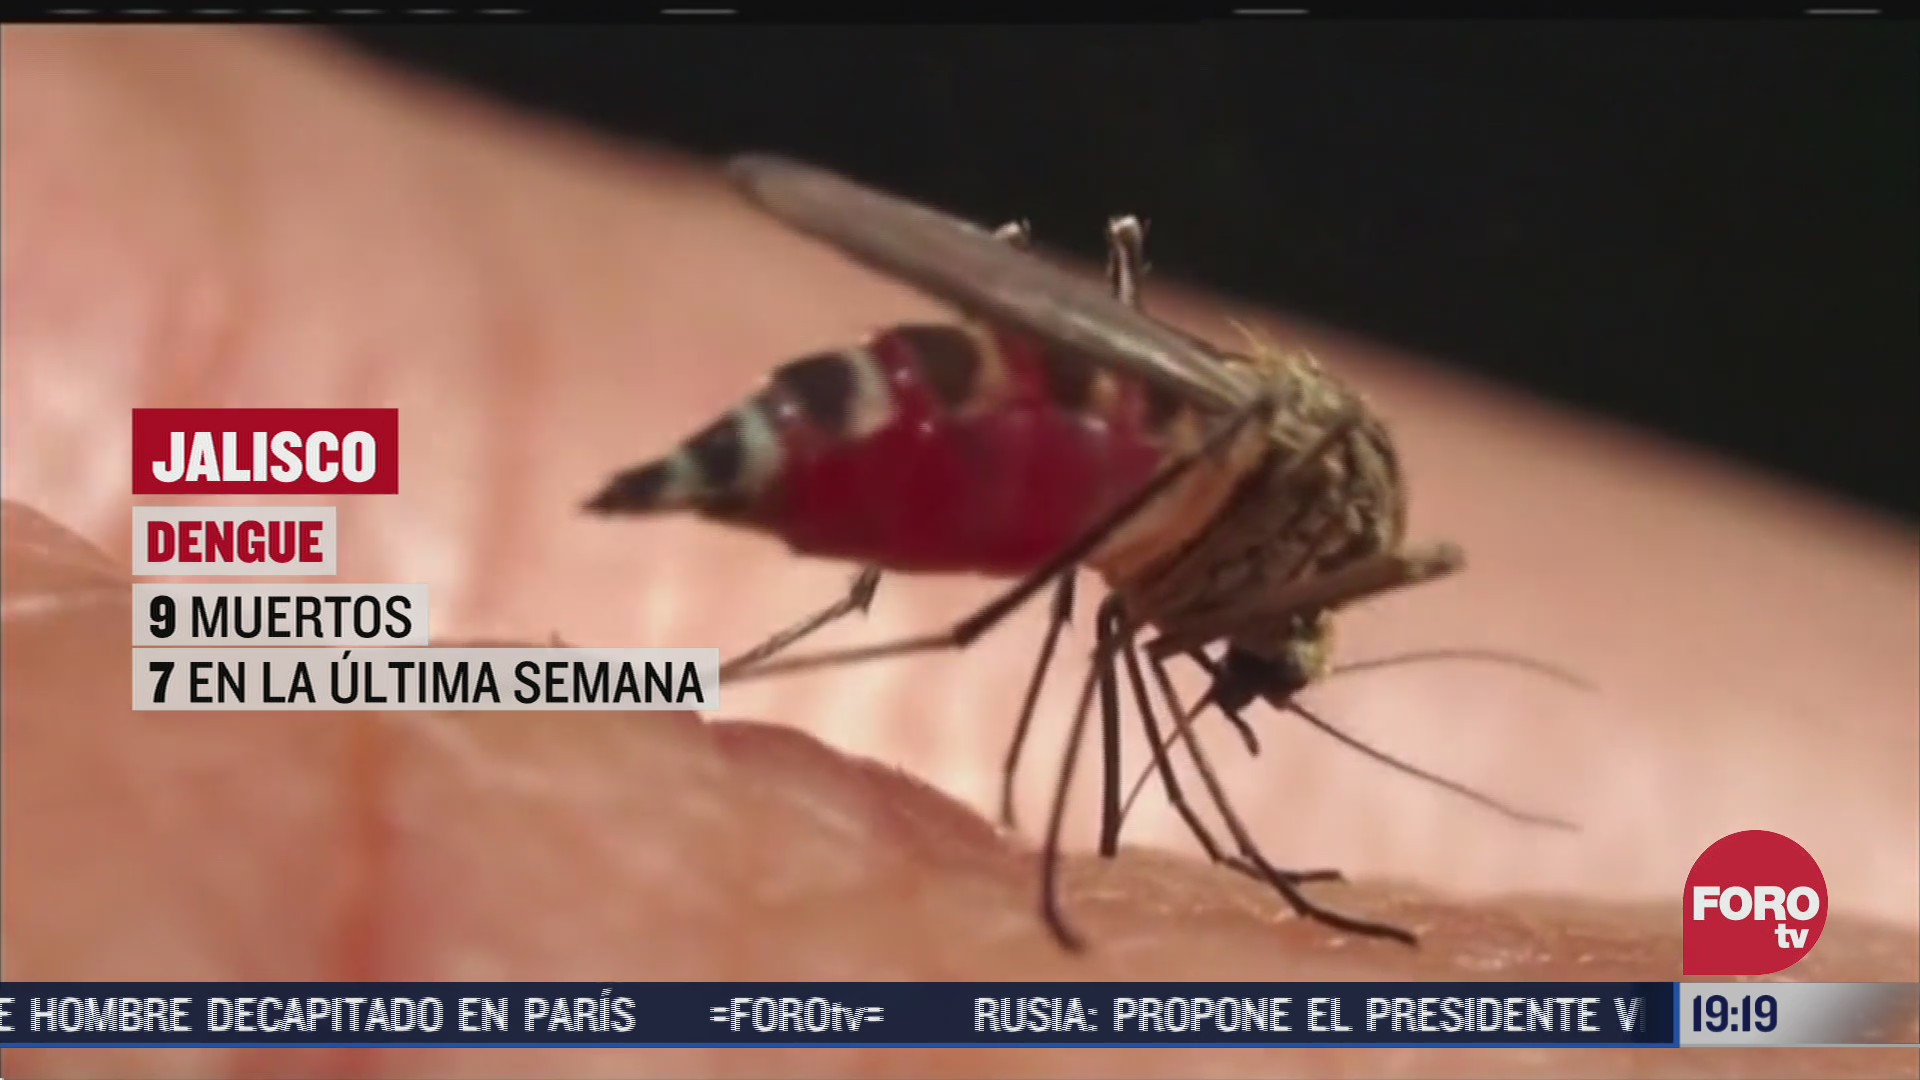 mosquito del dengue causa 9 muertes en Jalisco, México